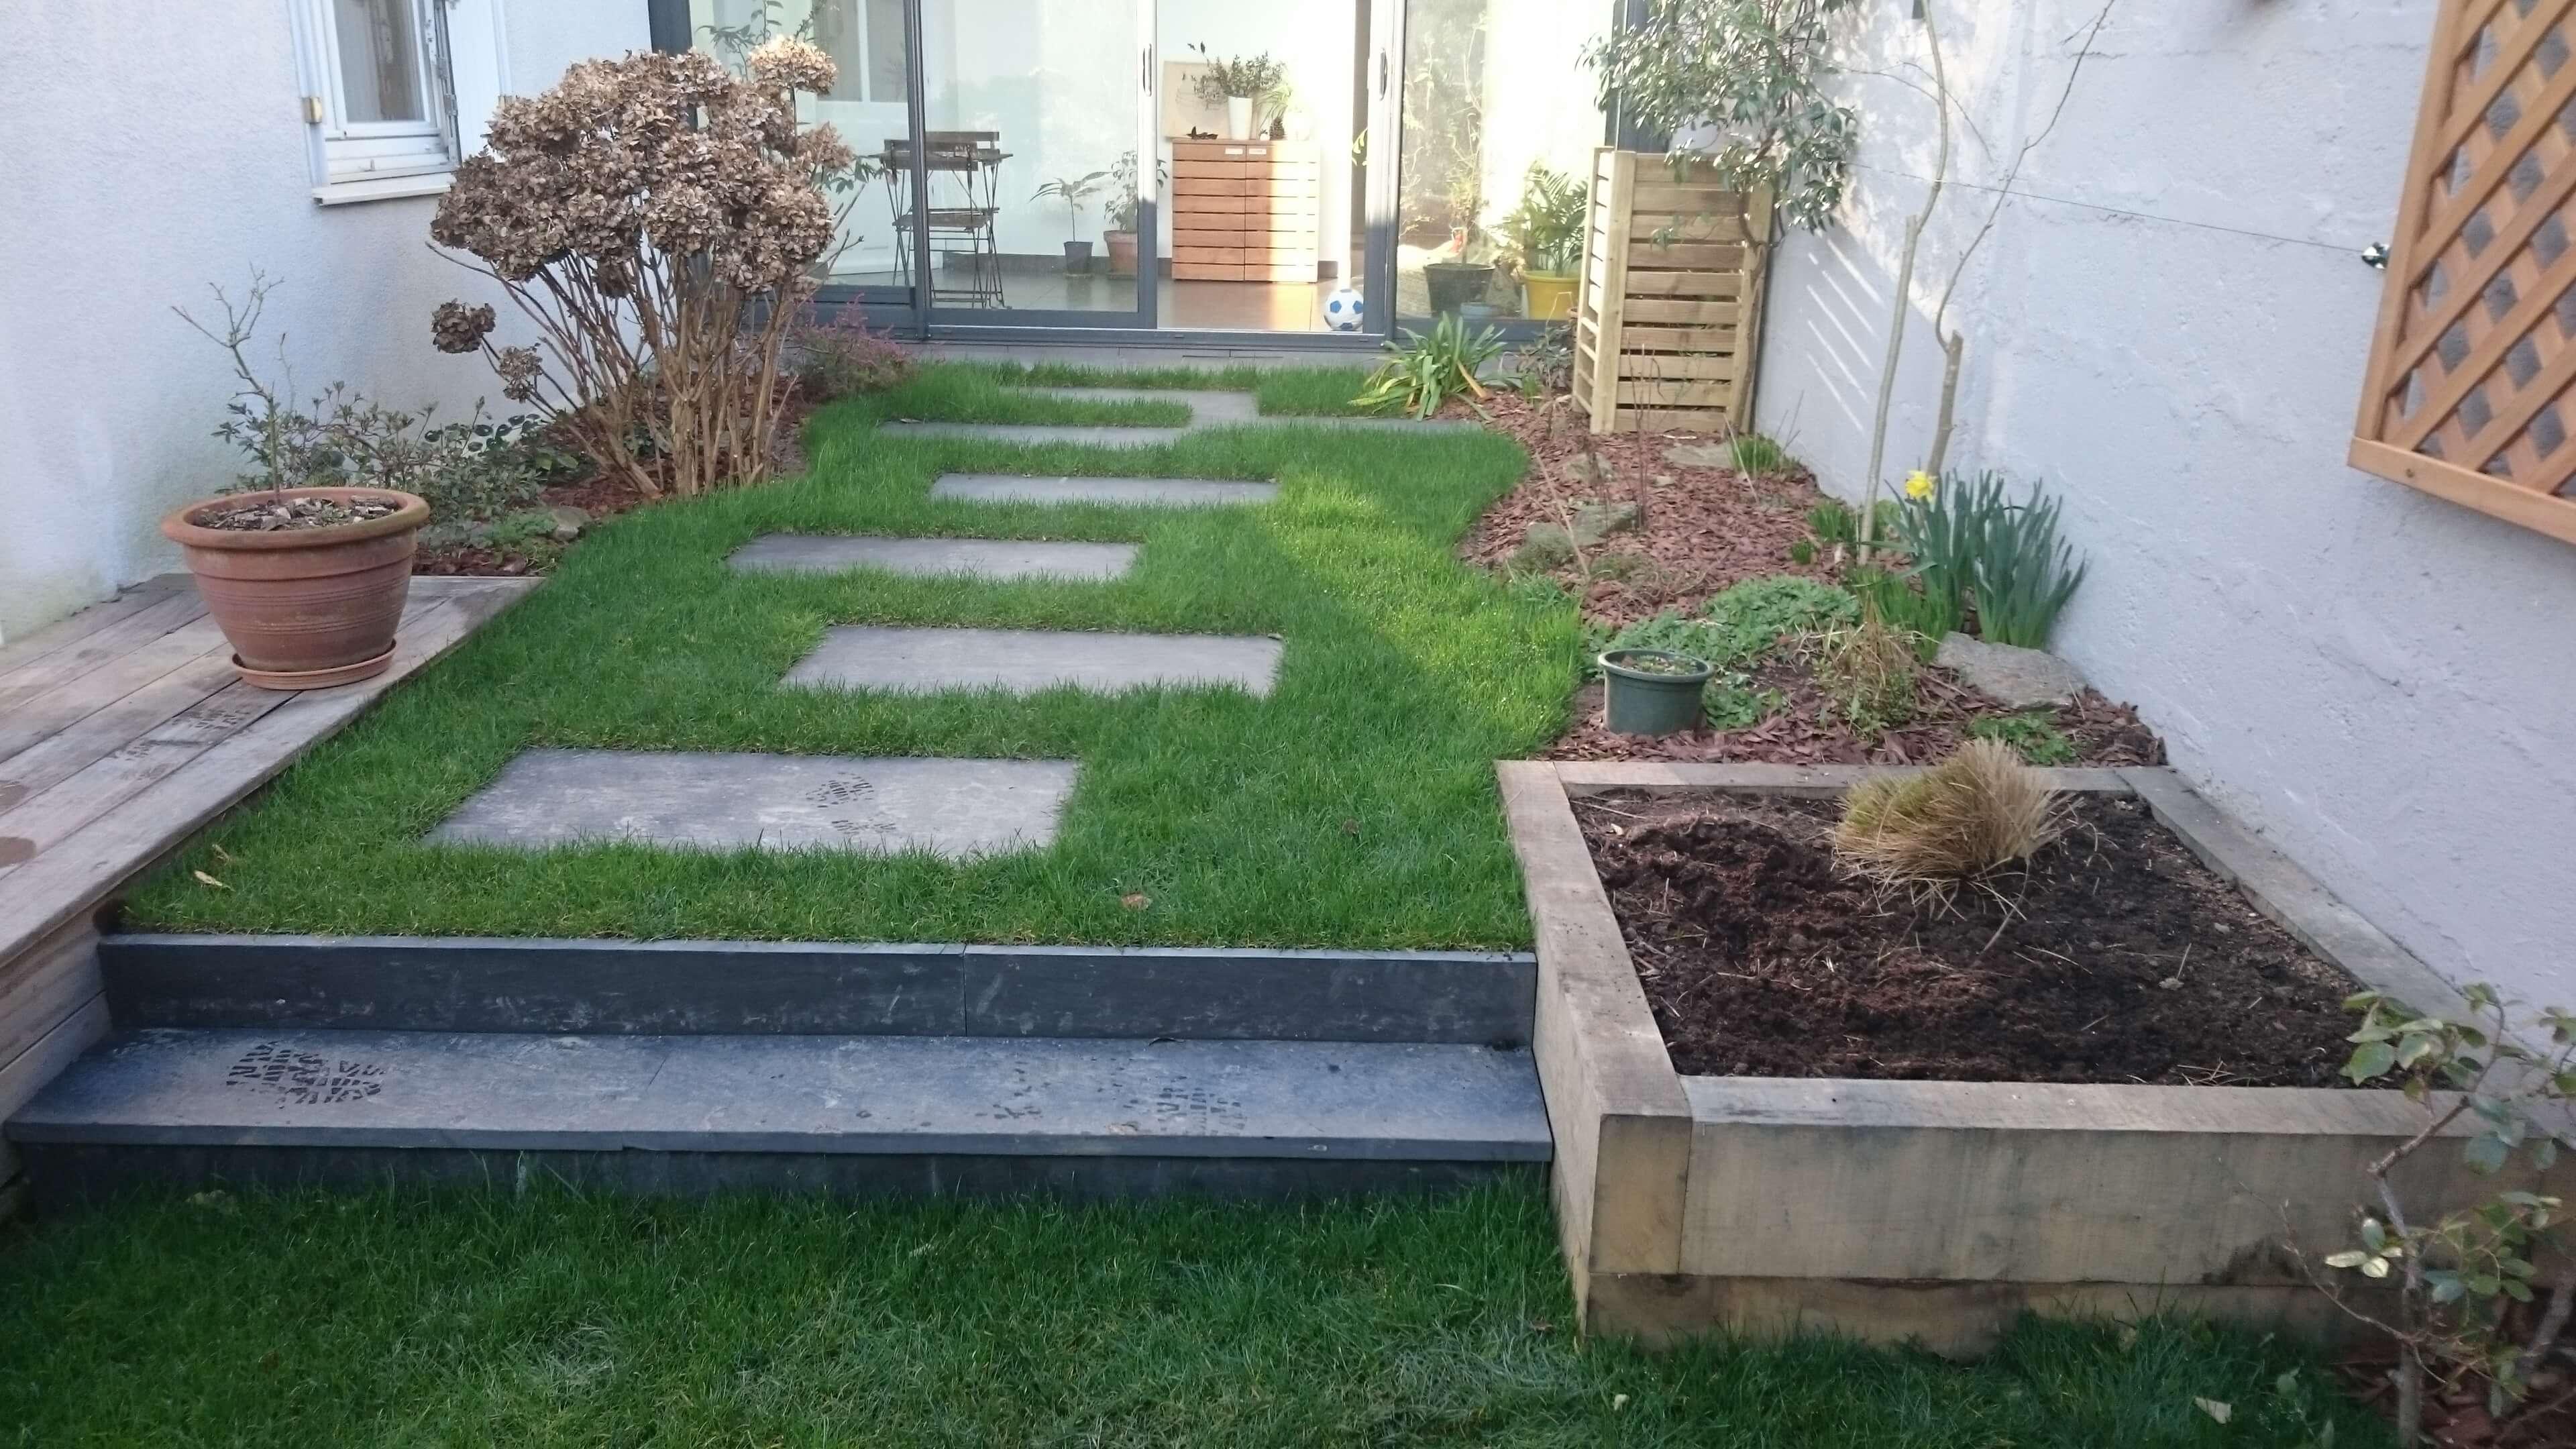 Entretien jardin nantes 59697 jardin id es for Entretien jardin nantes